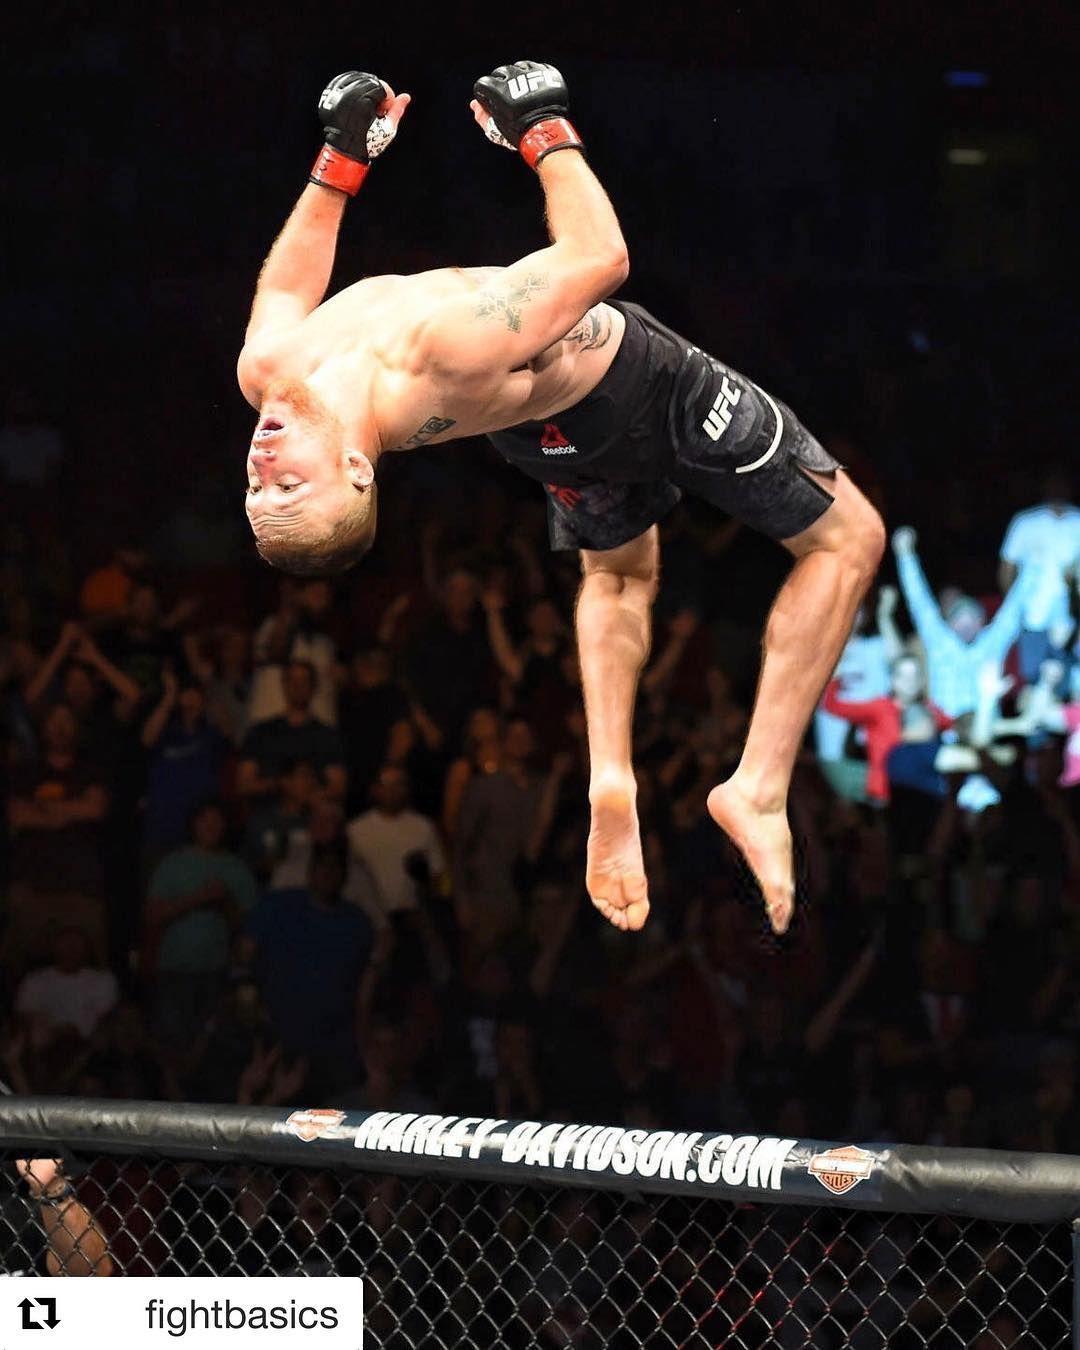 Justin Gaethje On Instagram Nothing Like It Adrenaline Mma Combatsports Ufc Celebration Combat Philadelphia Mainevent Ufcphilade In 2020 Ufc Mma Sports